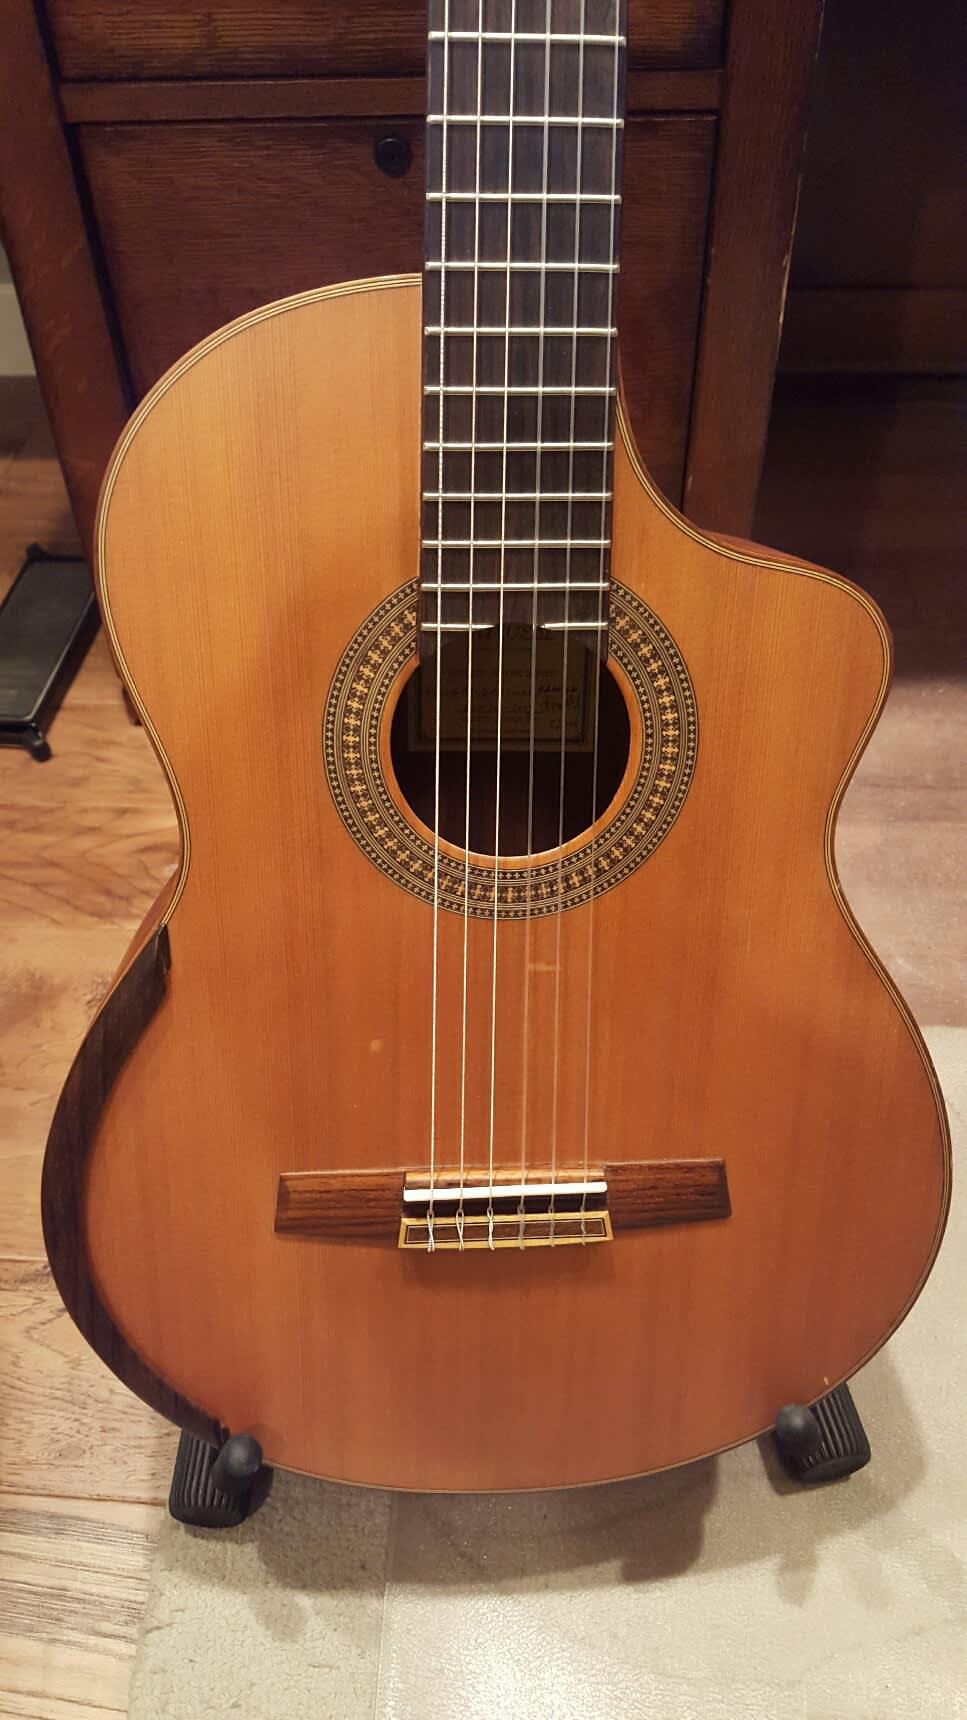 Harvest Master Guitar Series Gcs 12ce Lattice Braced 2006